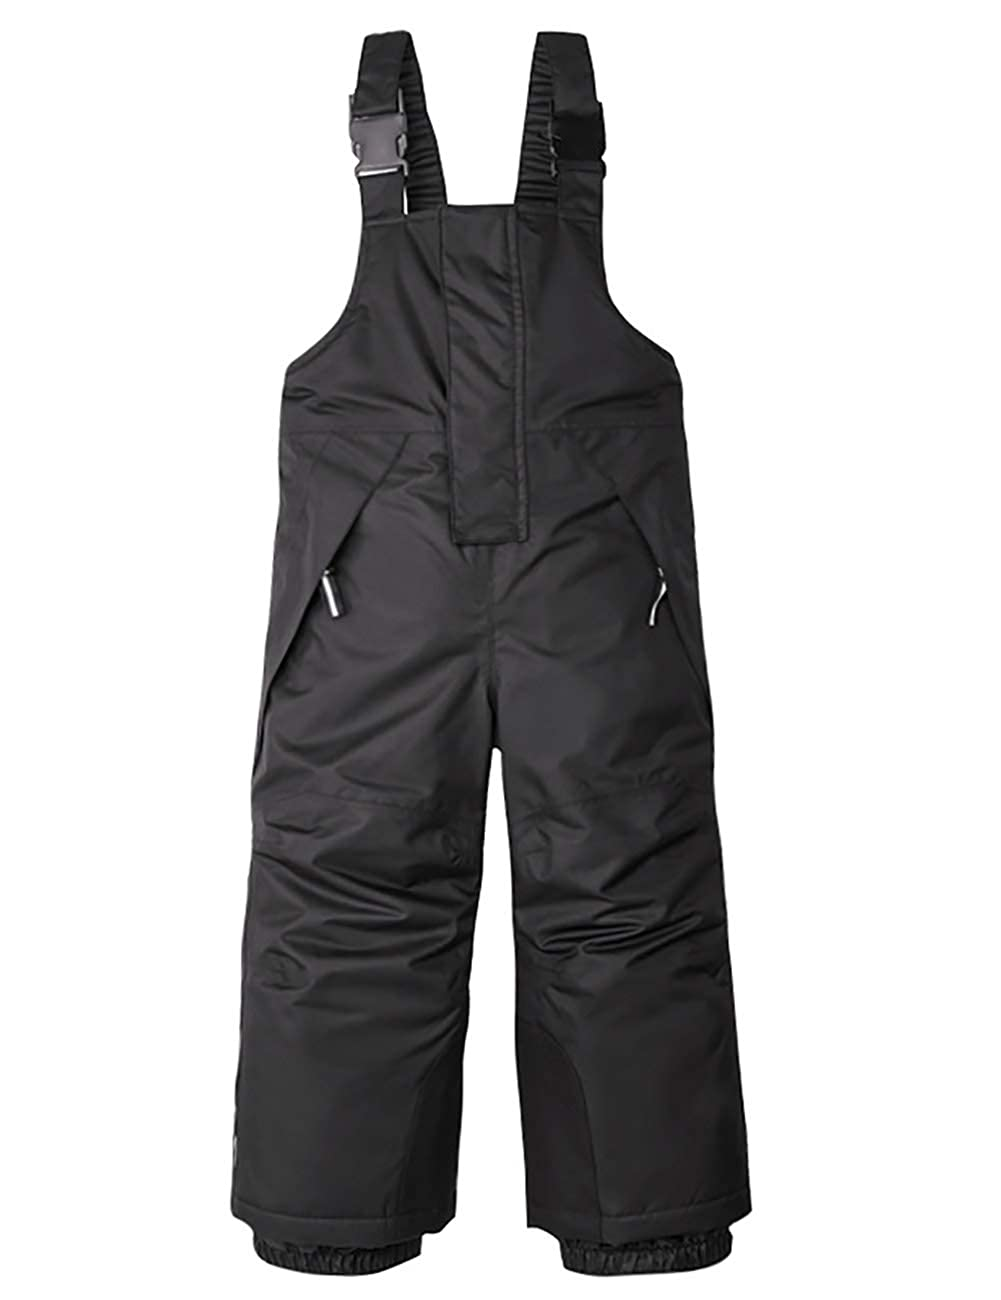 JMsDream Ski Bib Pants for Boys Girls Winter Warm Waterproof Windproof Thickened Trousers